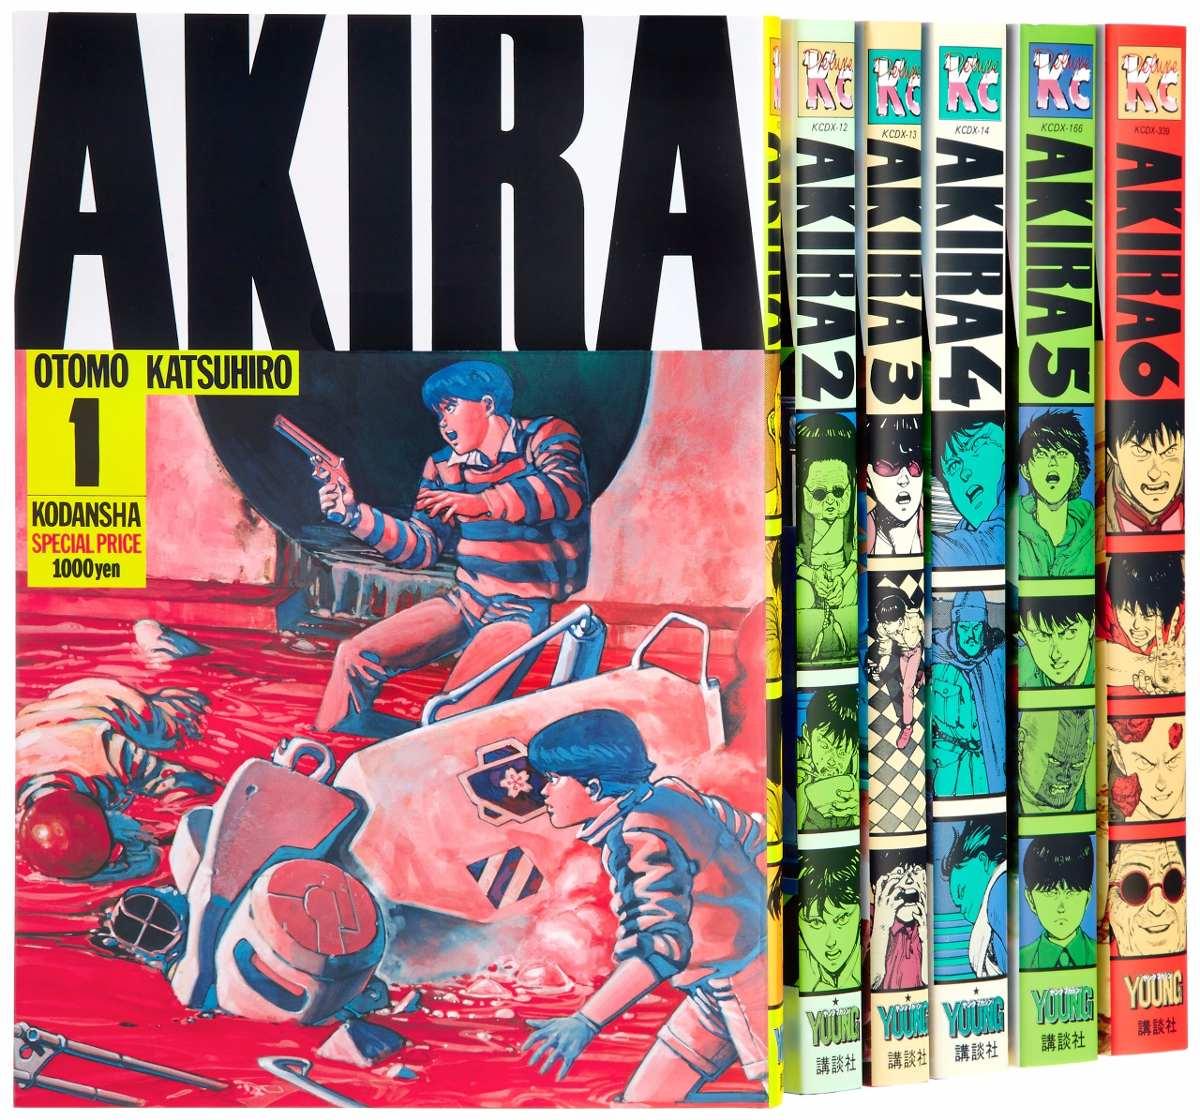 Golem-Comics-resena-Akira-katsuhiro otomo-08